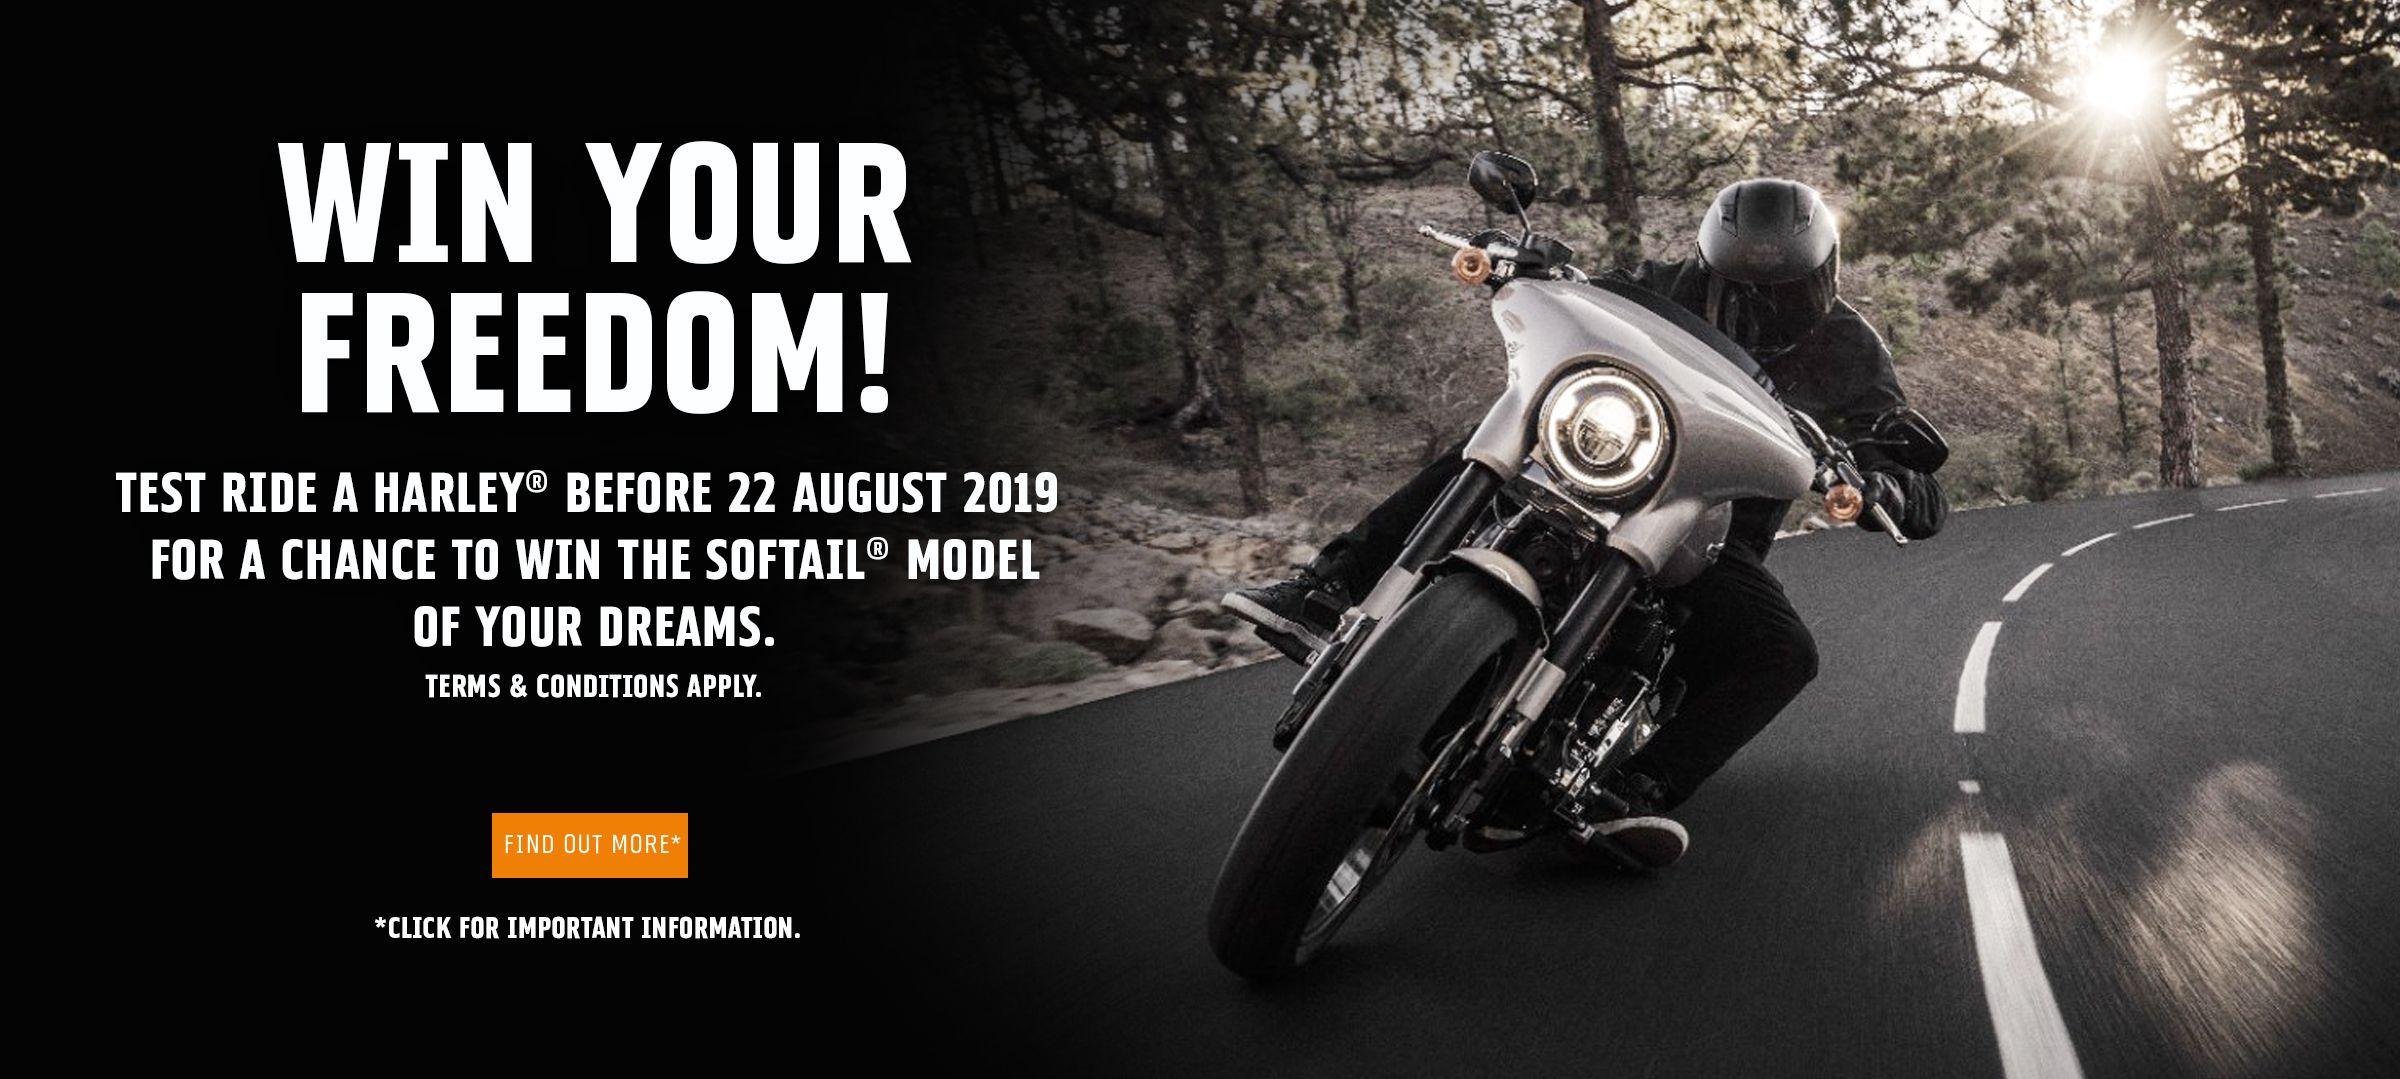 Sykes Harley-Davidson®